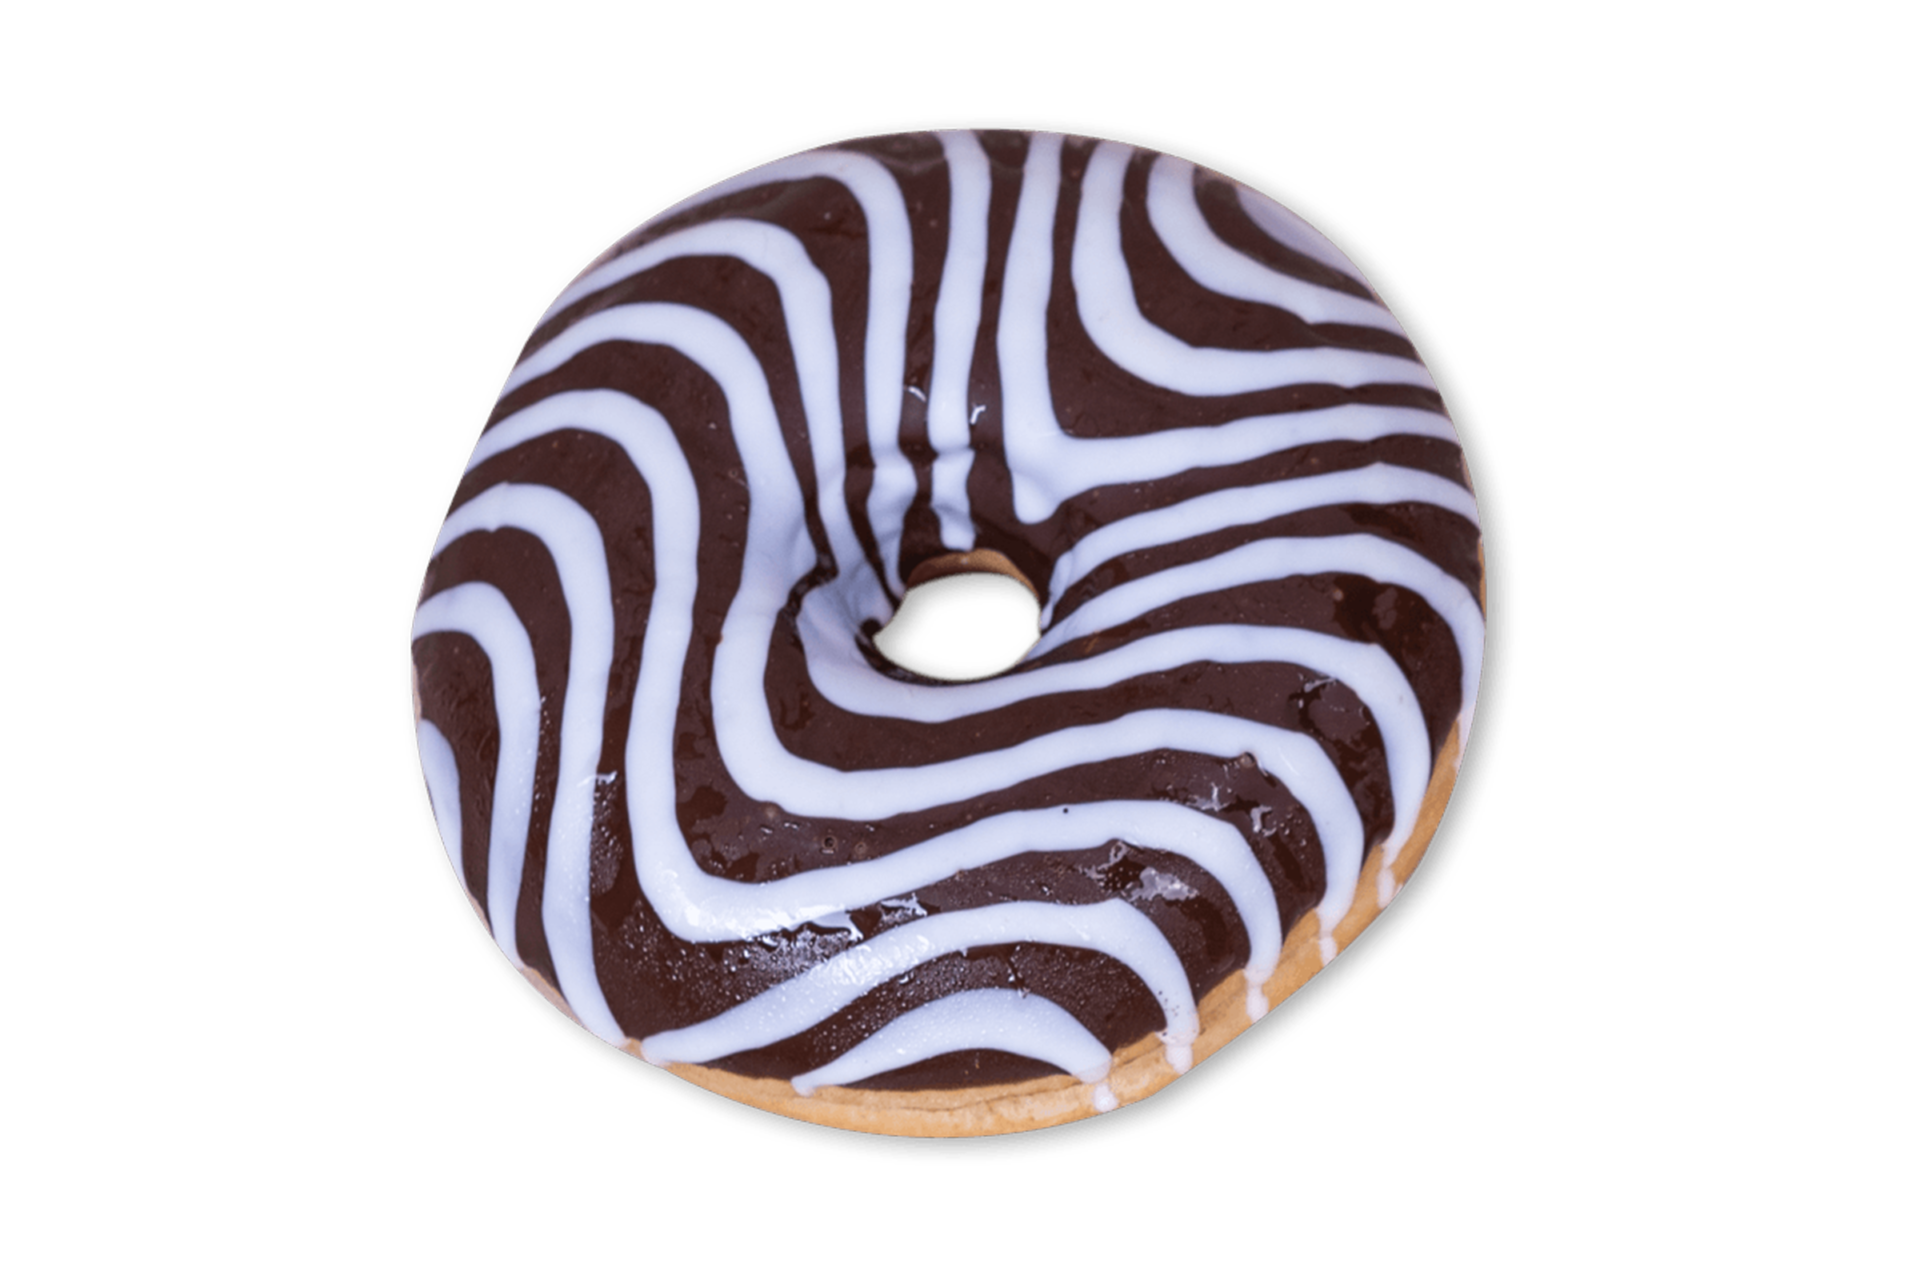 Donut Chocolate 1